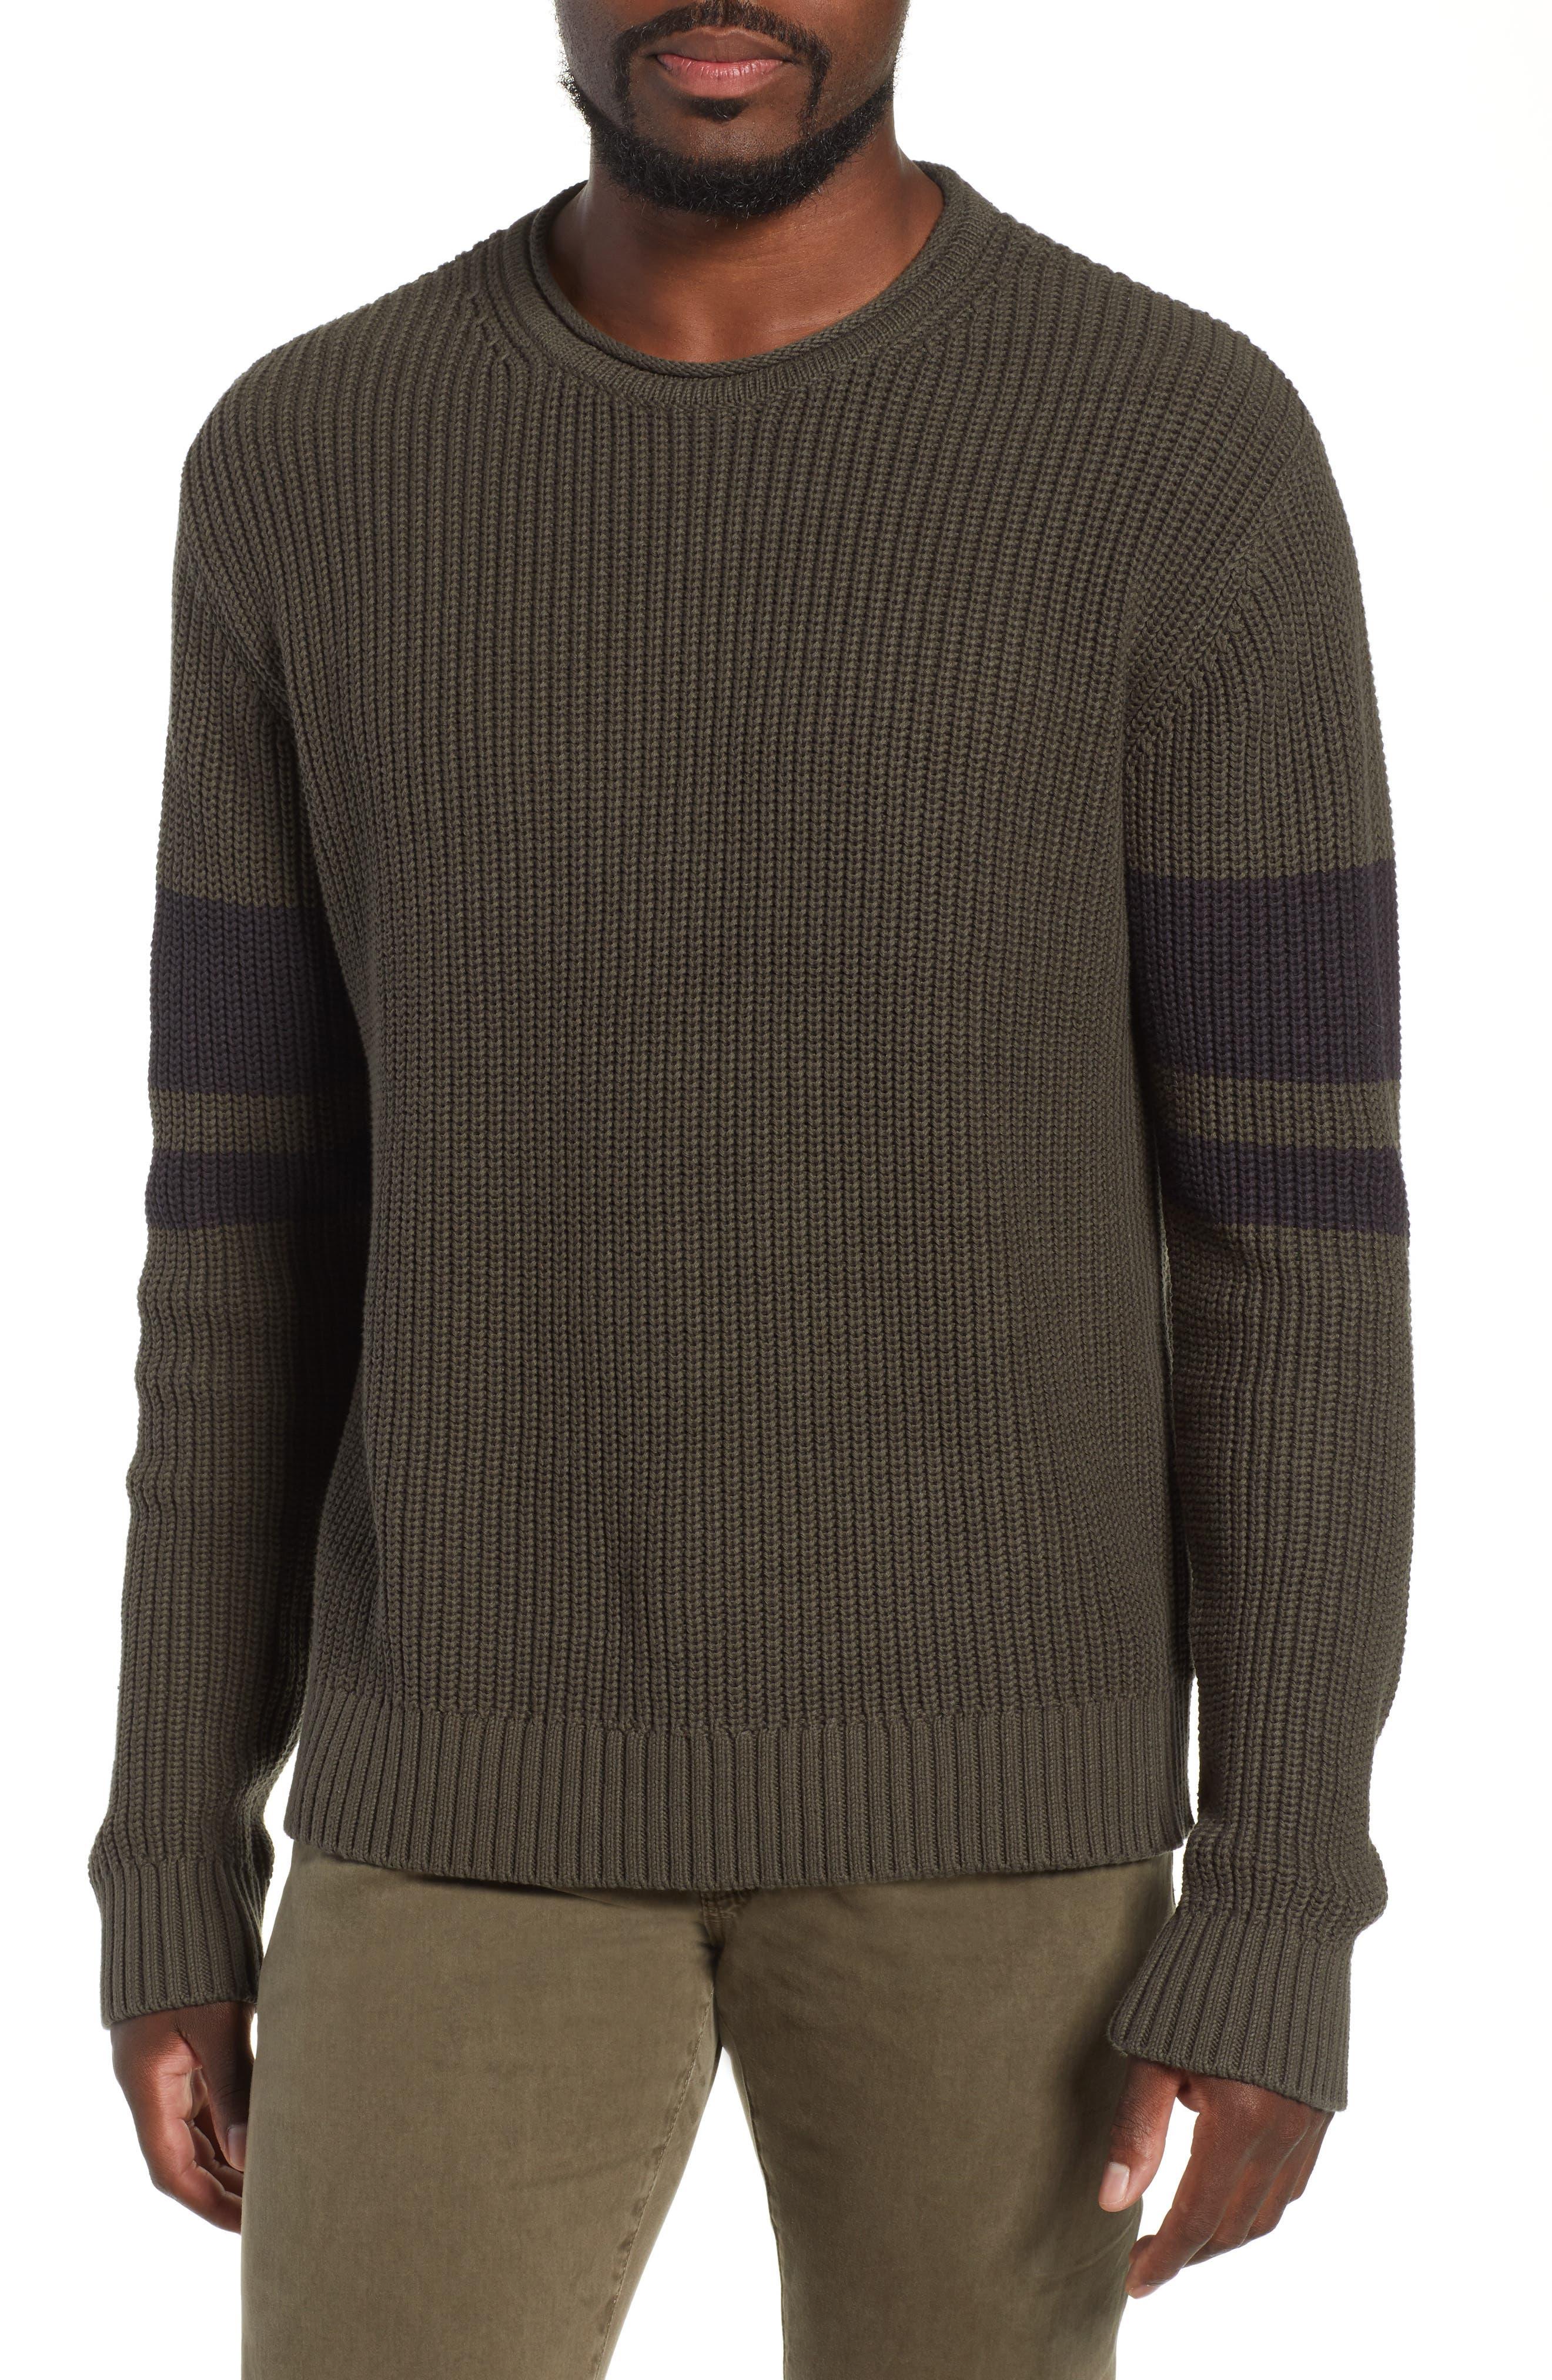 Jett Slim Fit Crewneck Sweater,                         Main,                         color, OAK GROVE/ BLACK